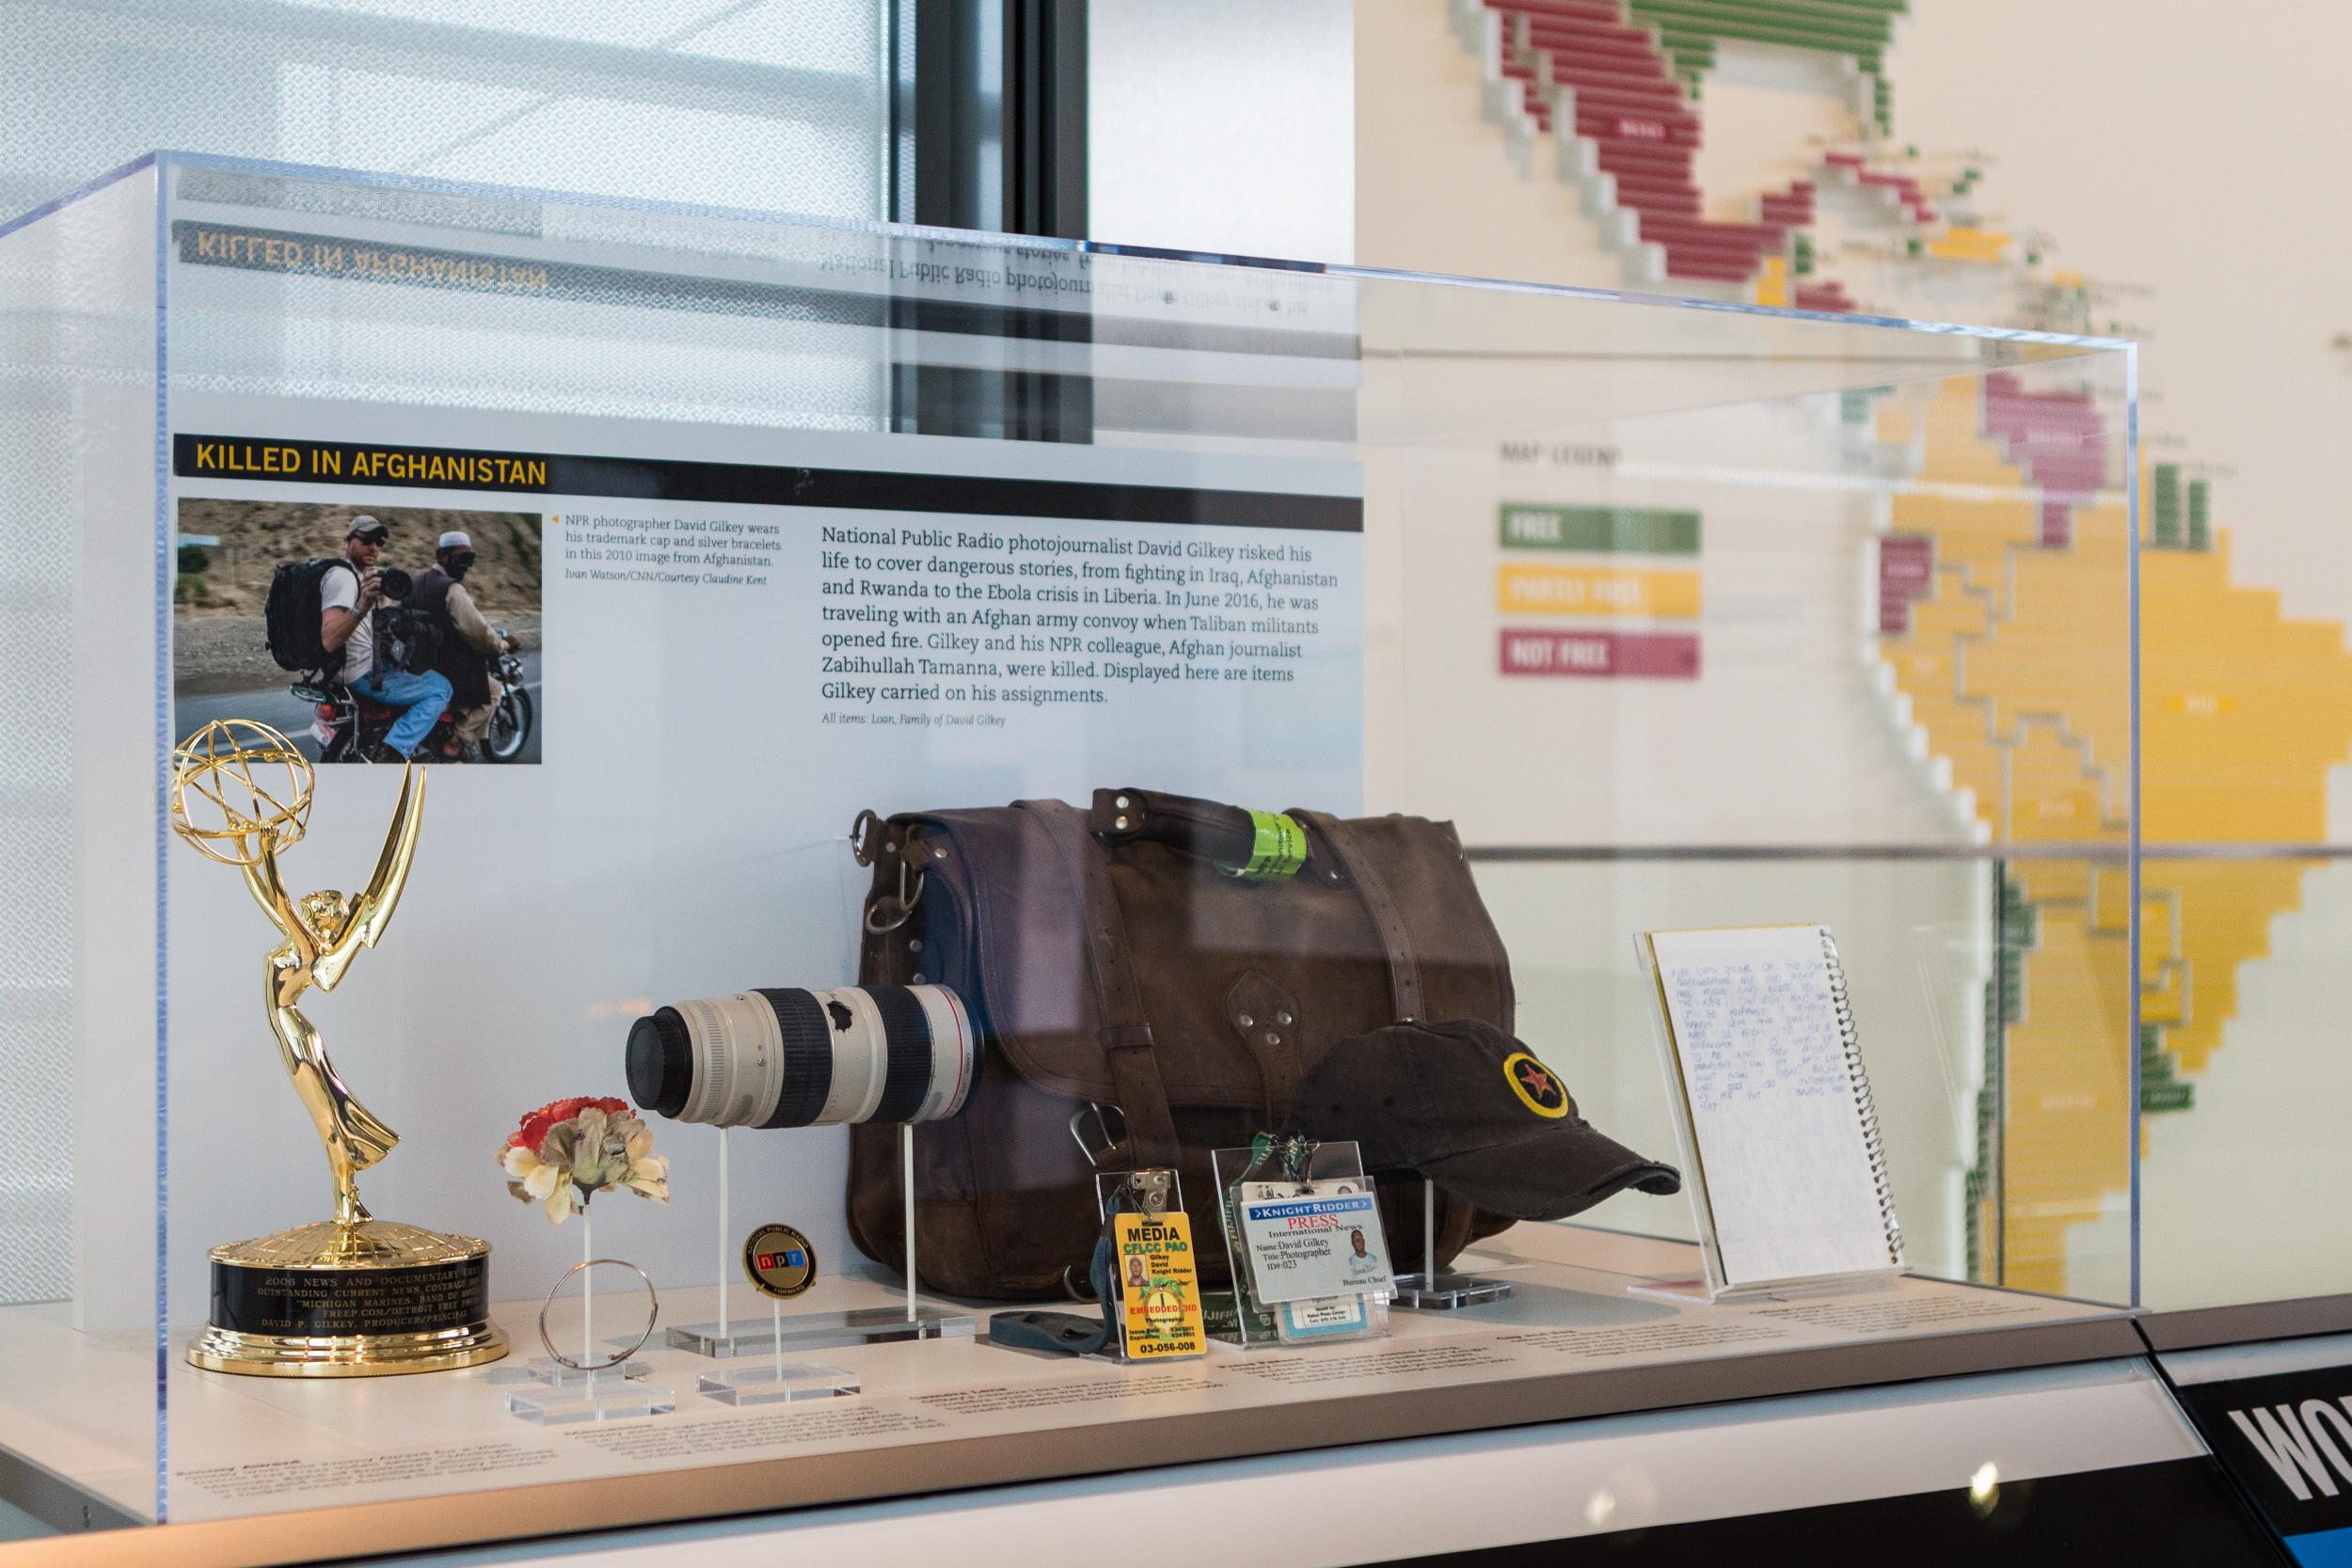 Artifact case containing personal items of photojournalist David Gilkey.